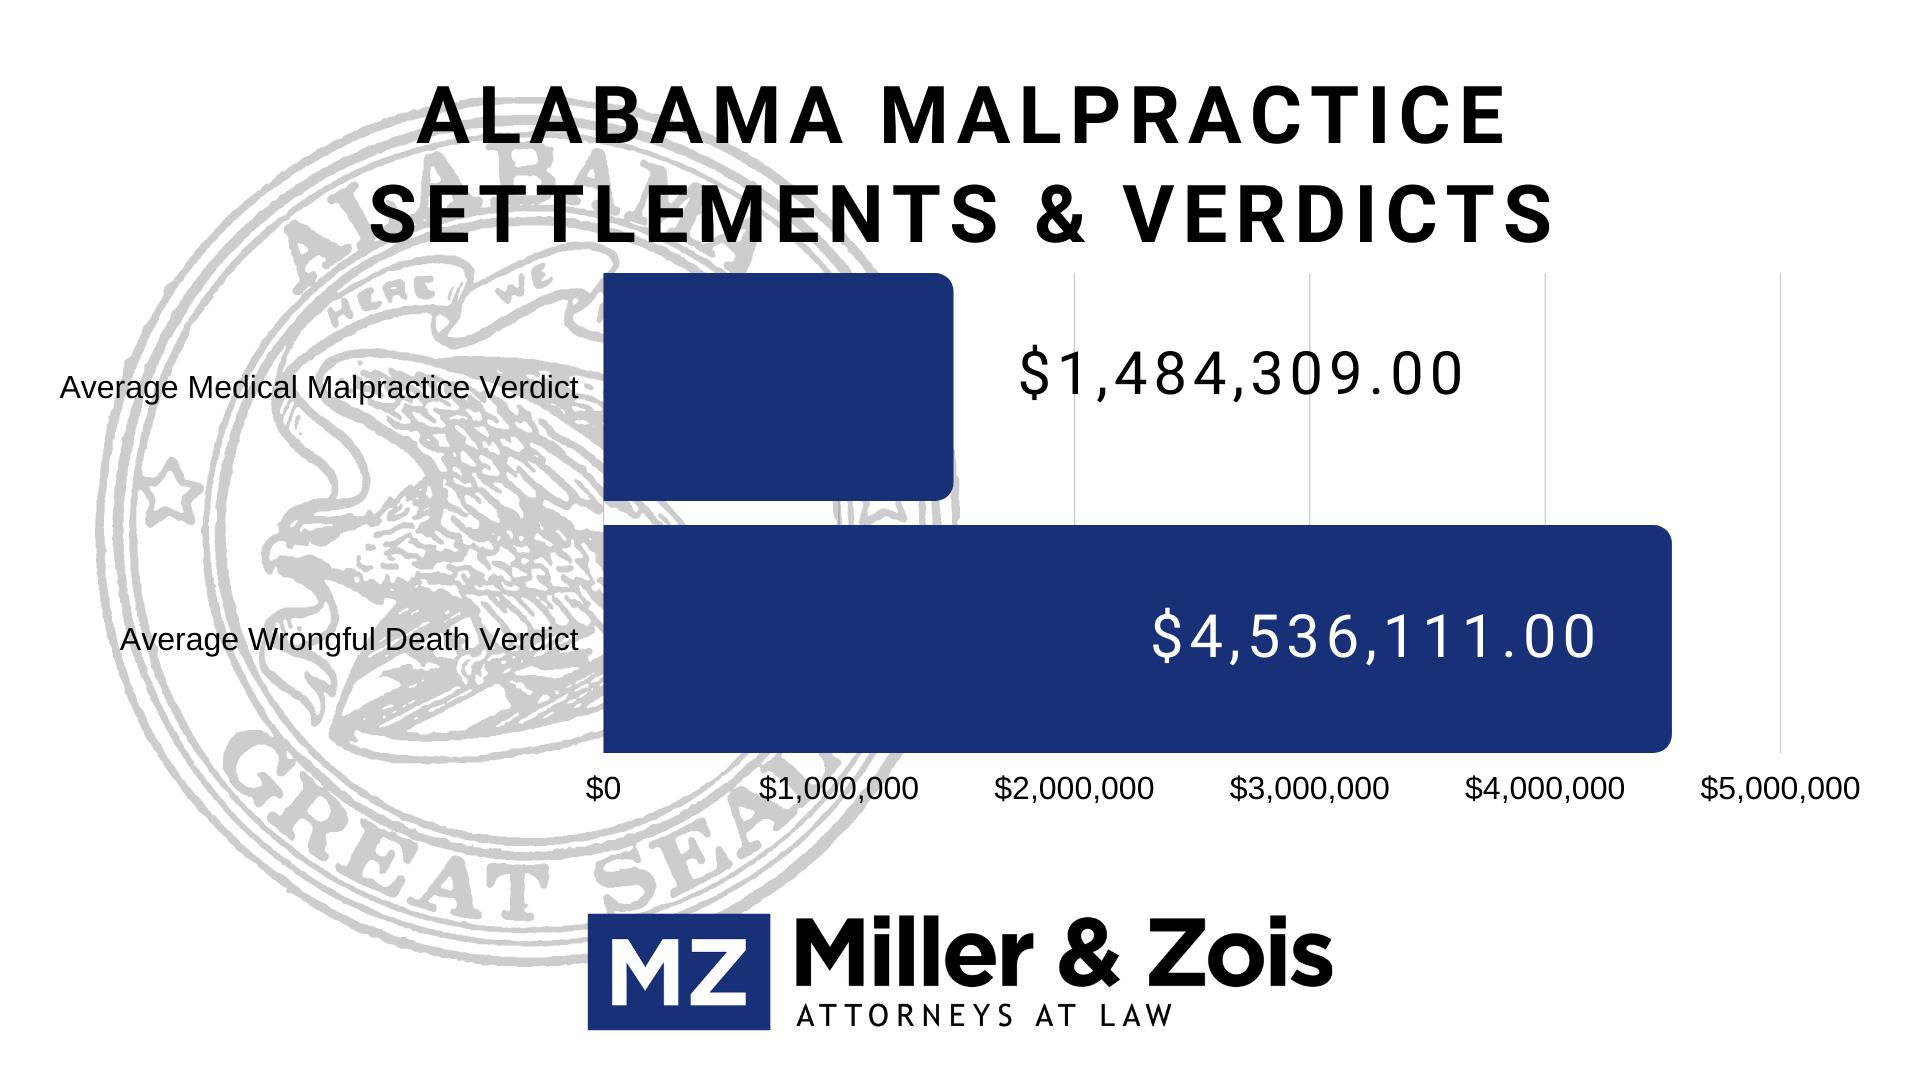 Alabama settlements